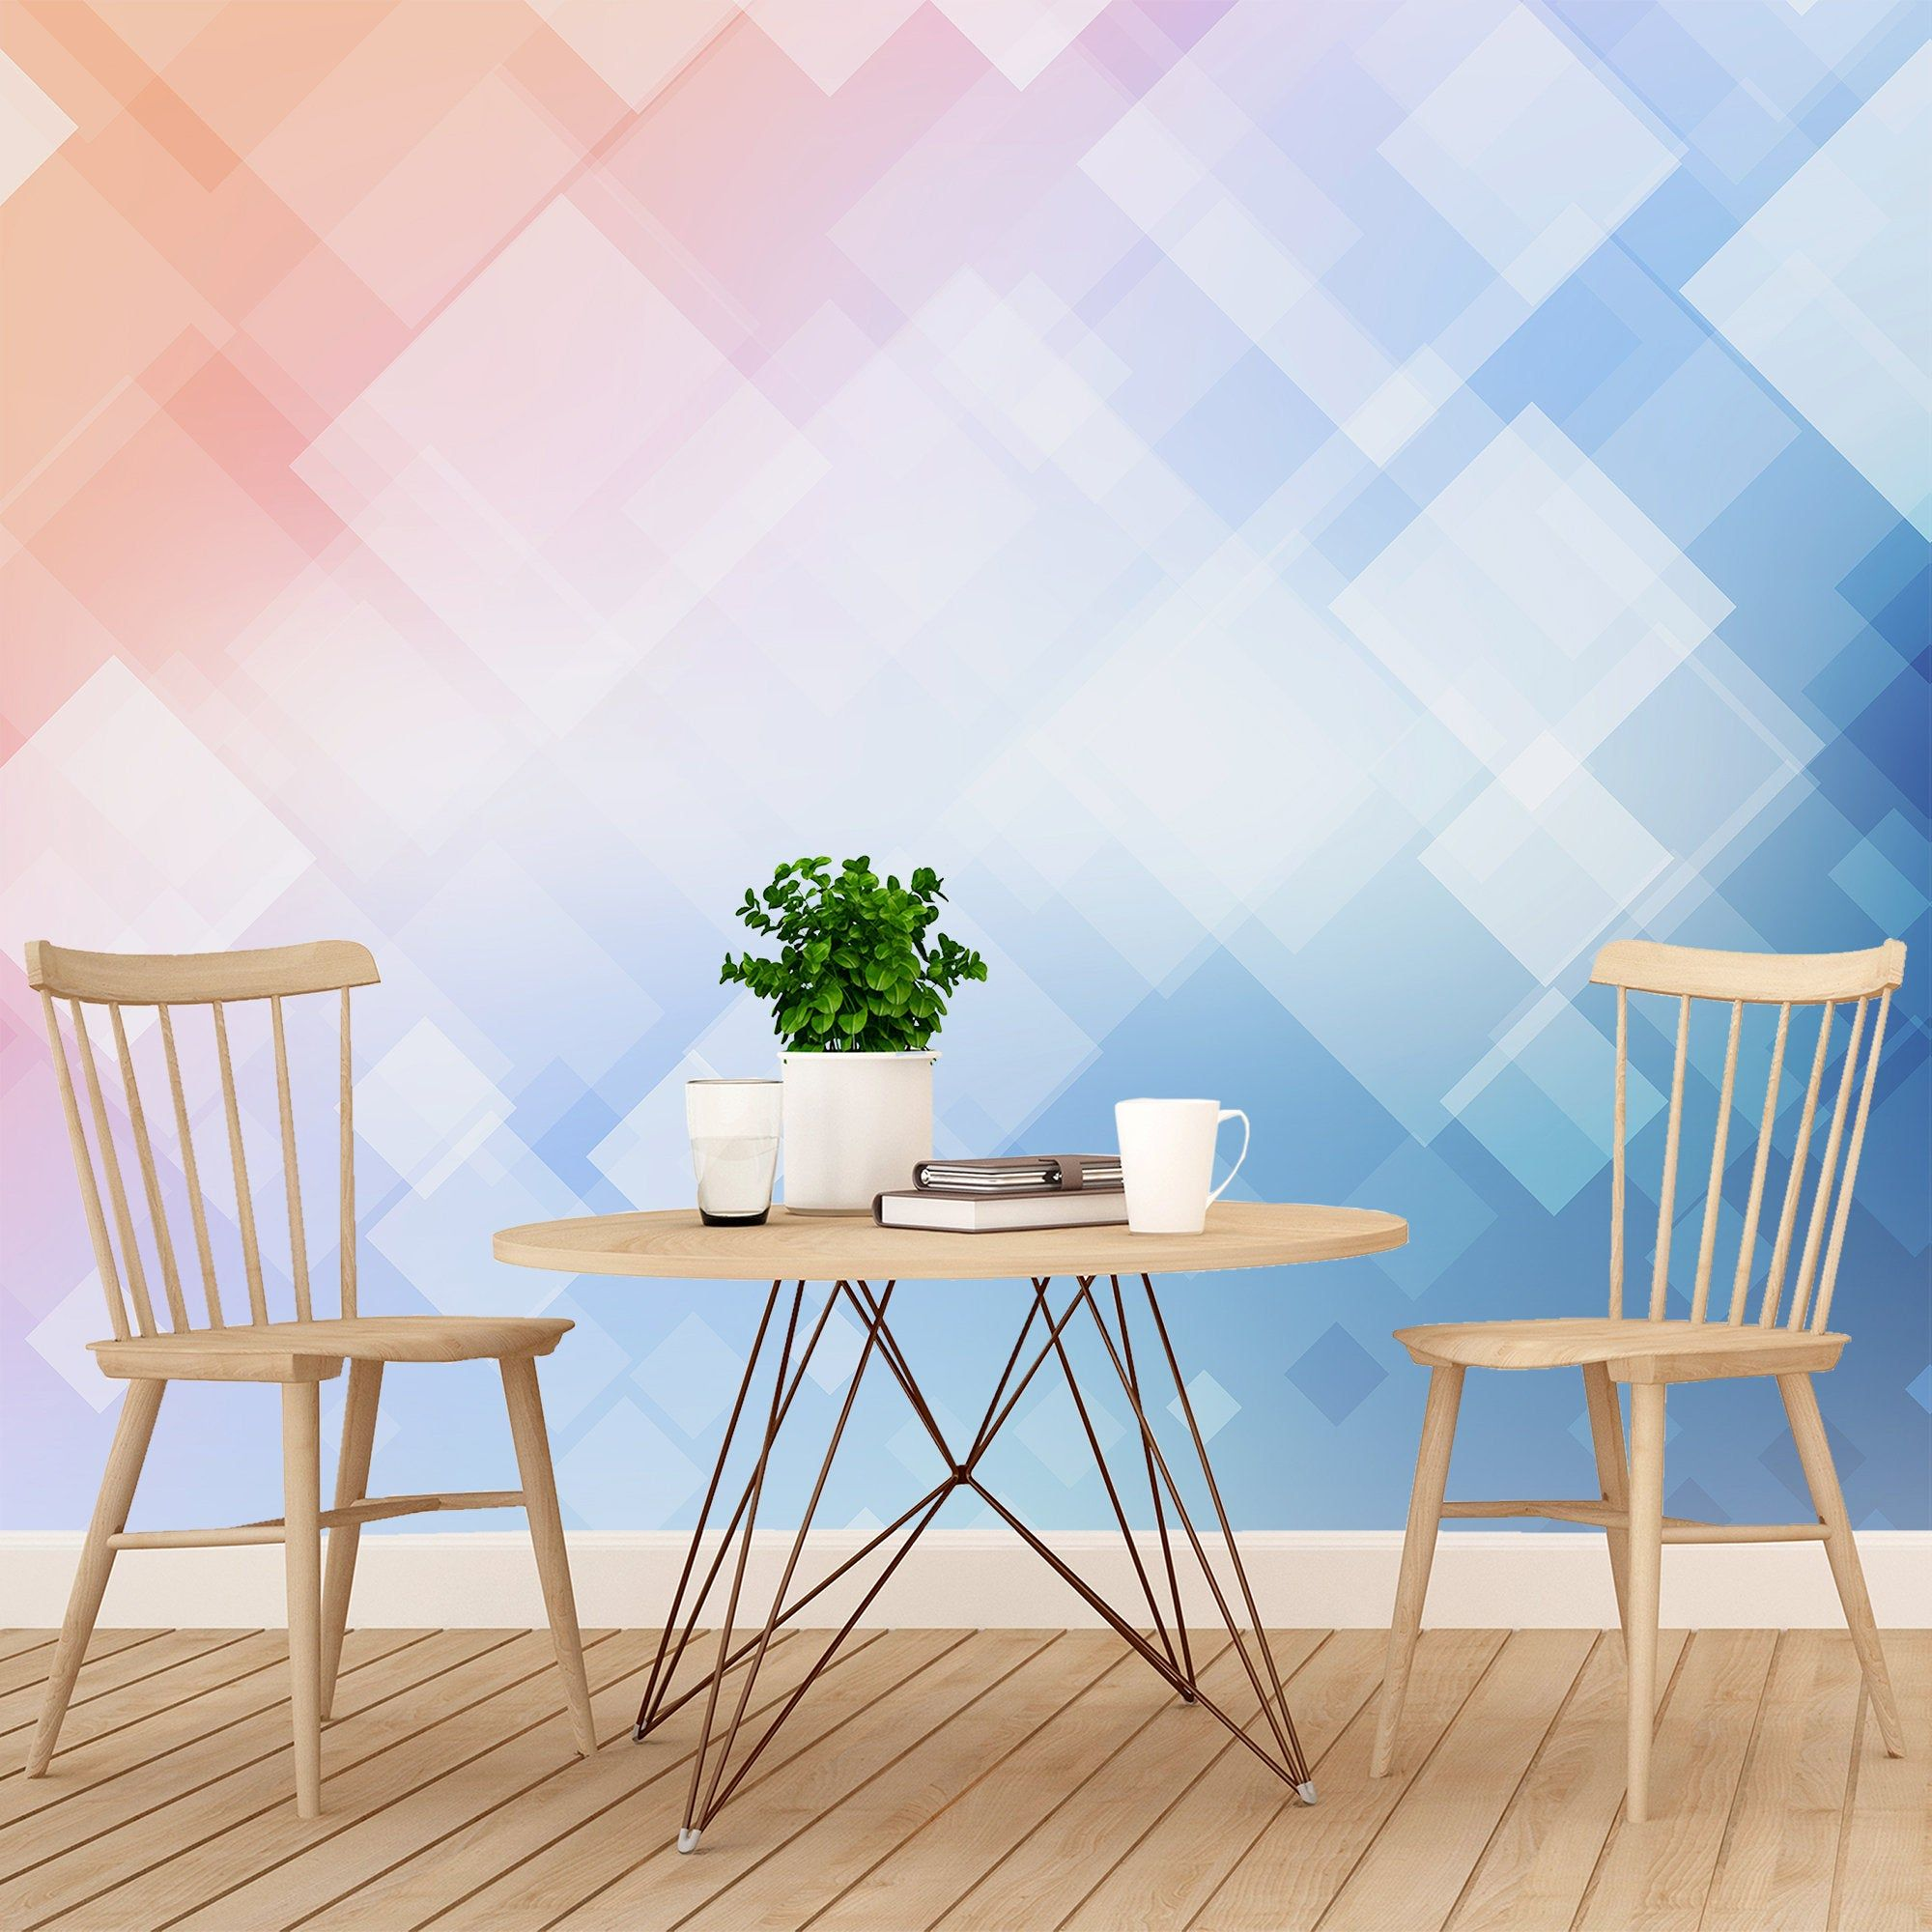 Removable Wallpaper Peel And Stick Wallpaper Wall Decor Etsy Wallpaper Walls Decor Removable Wallpaper Wall Wallpaper